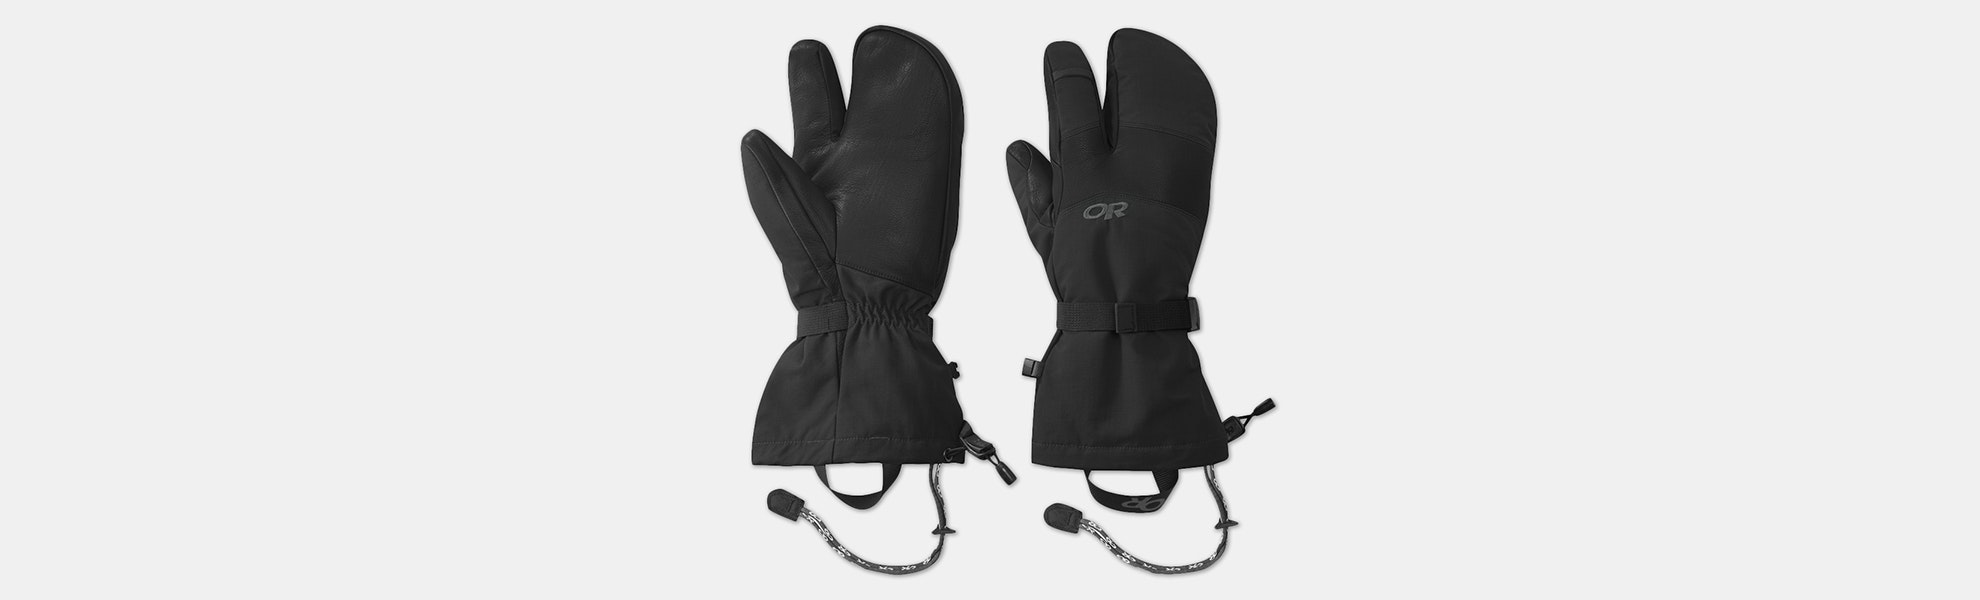 Outdoor Research Highcamp 3-Finger Men's Gloves